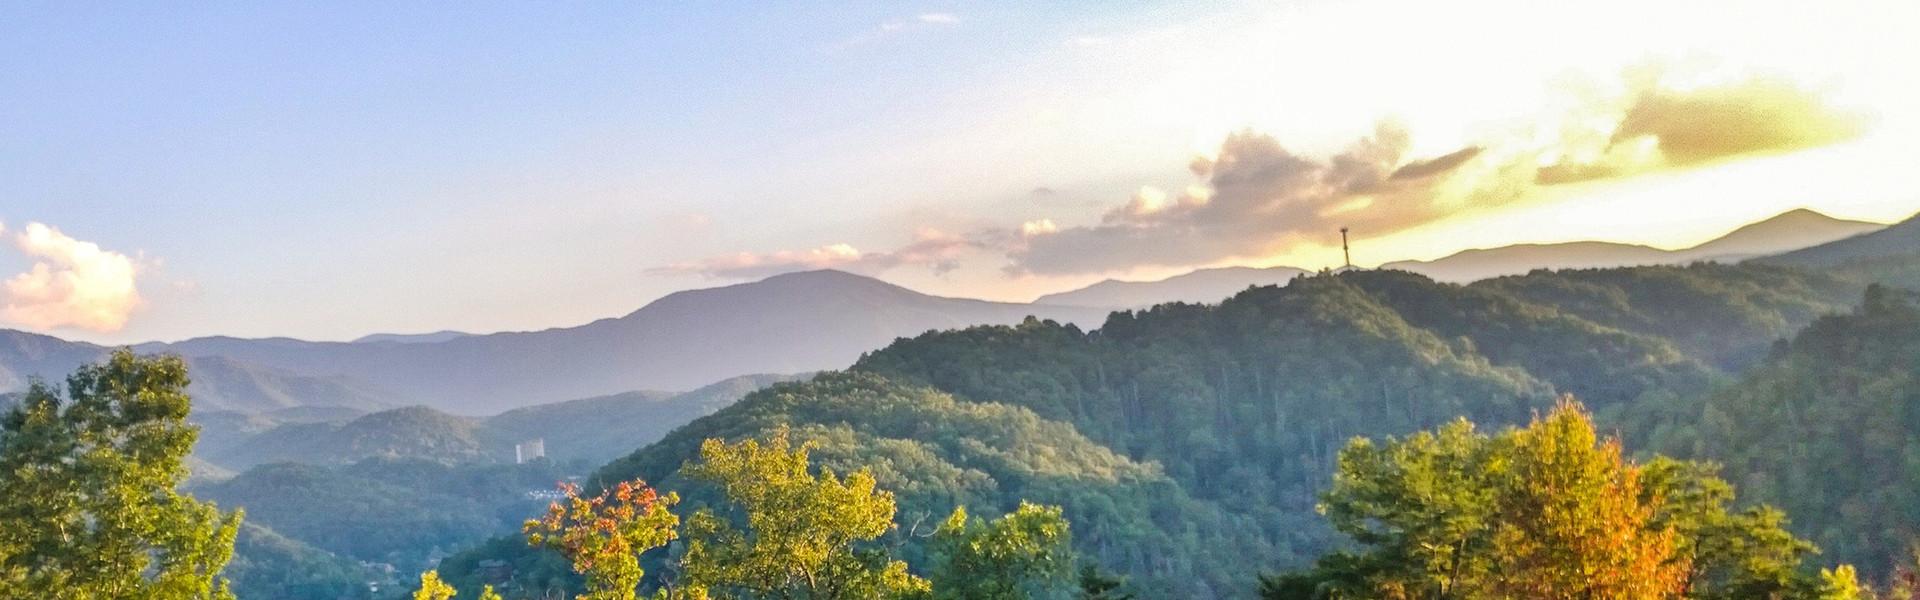 Gatlinburg Resort near the Smoky Mountains | Westgate Smoky Mountain Resort